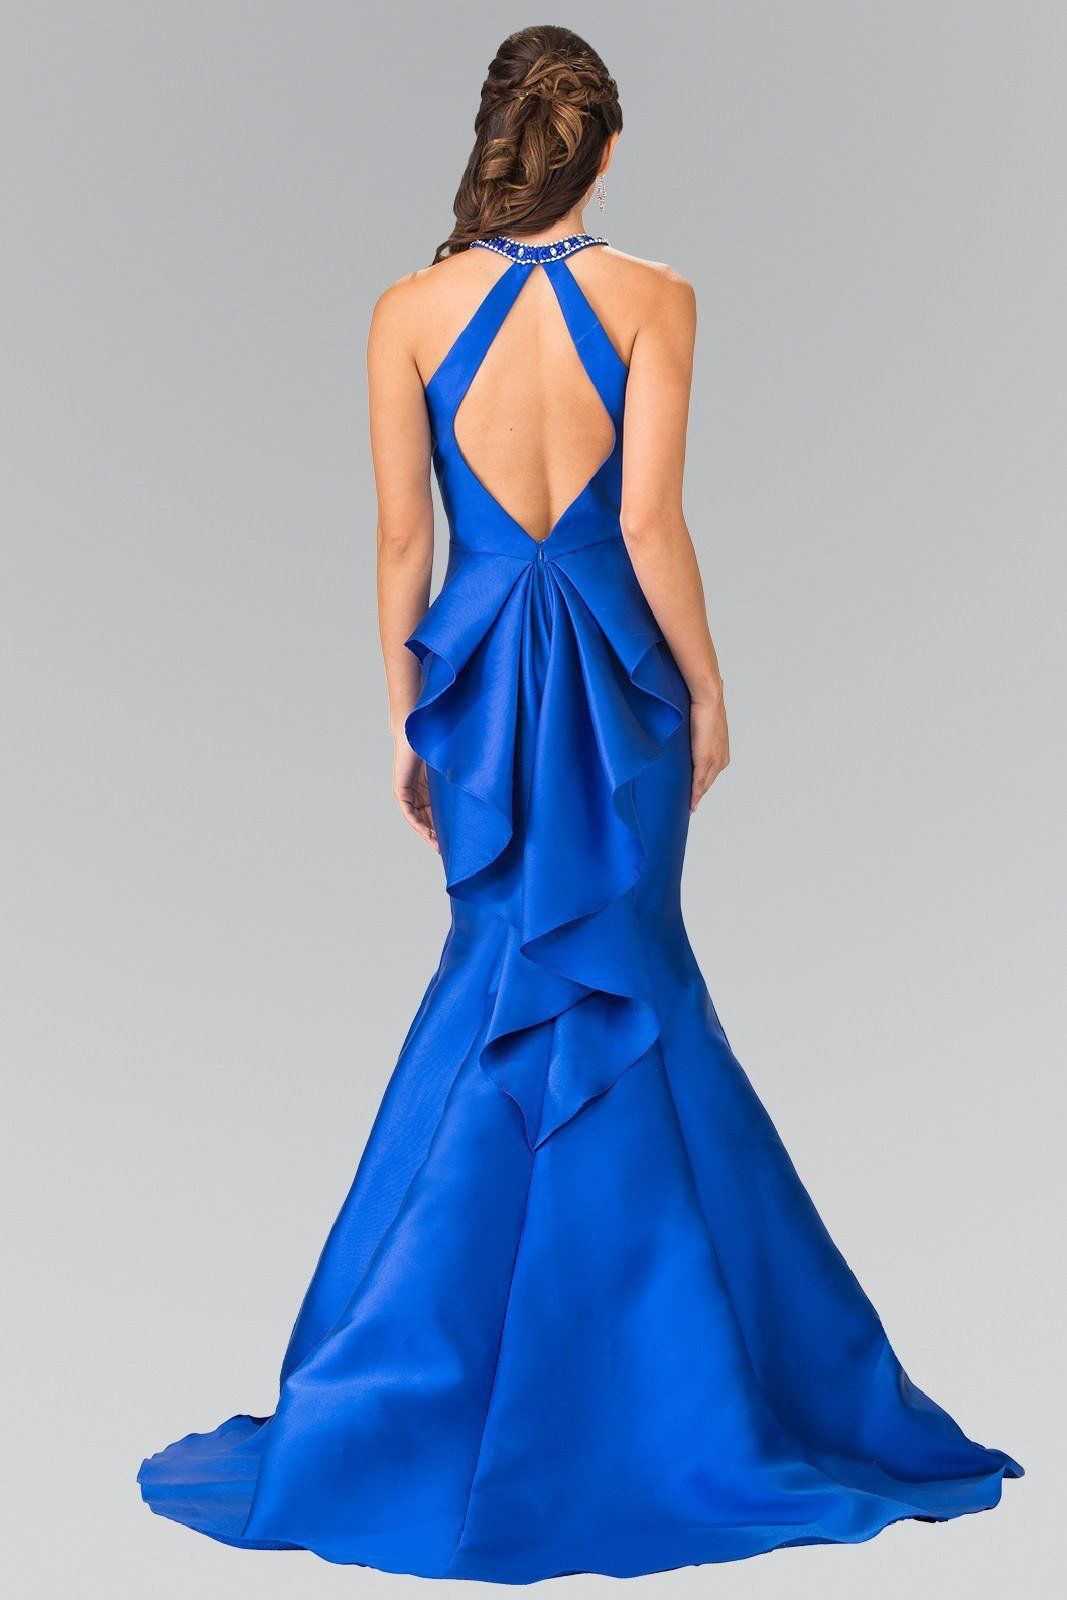 Mermaid satin prom dress gl blue styles pinterest formal